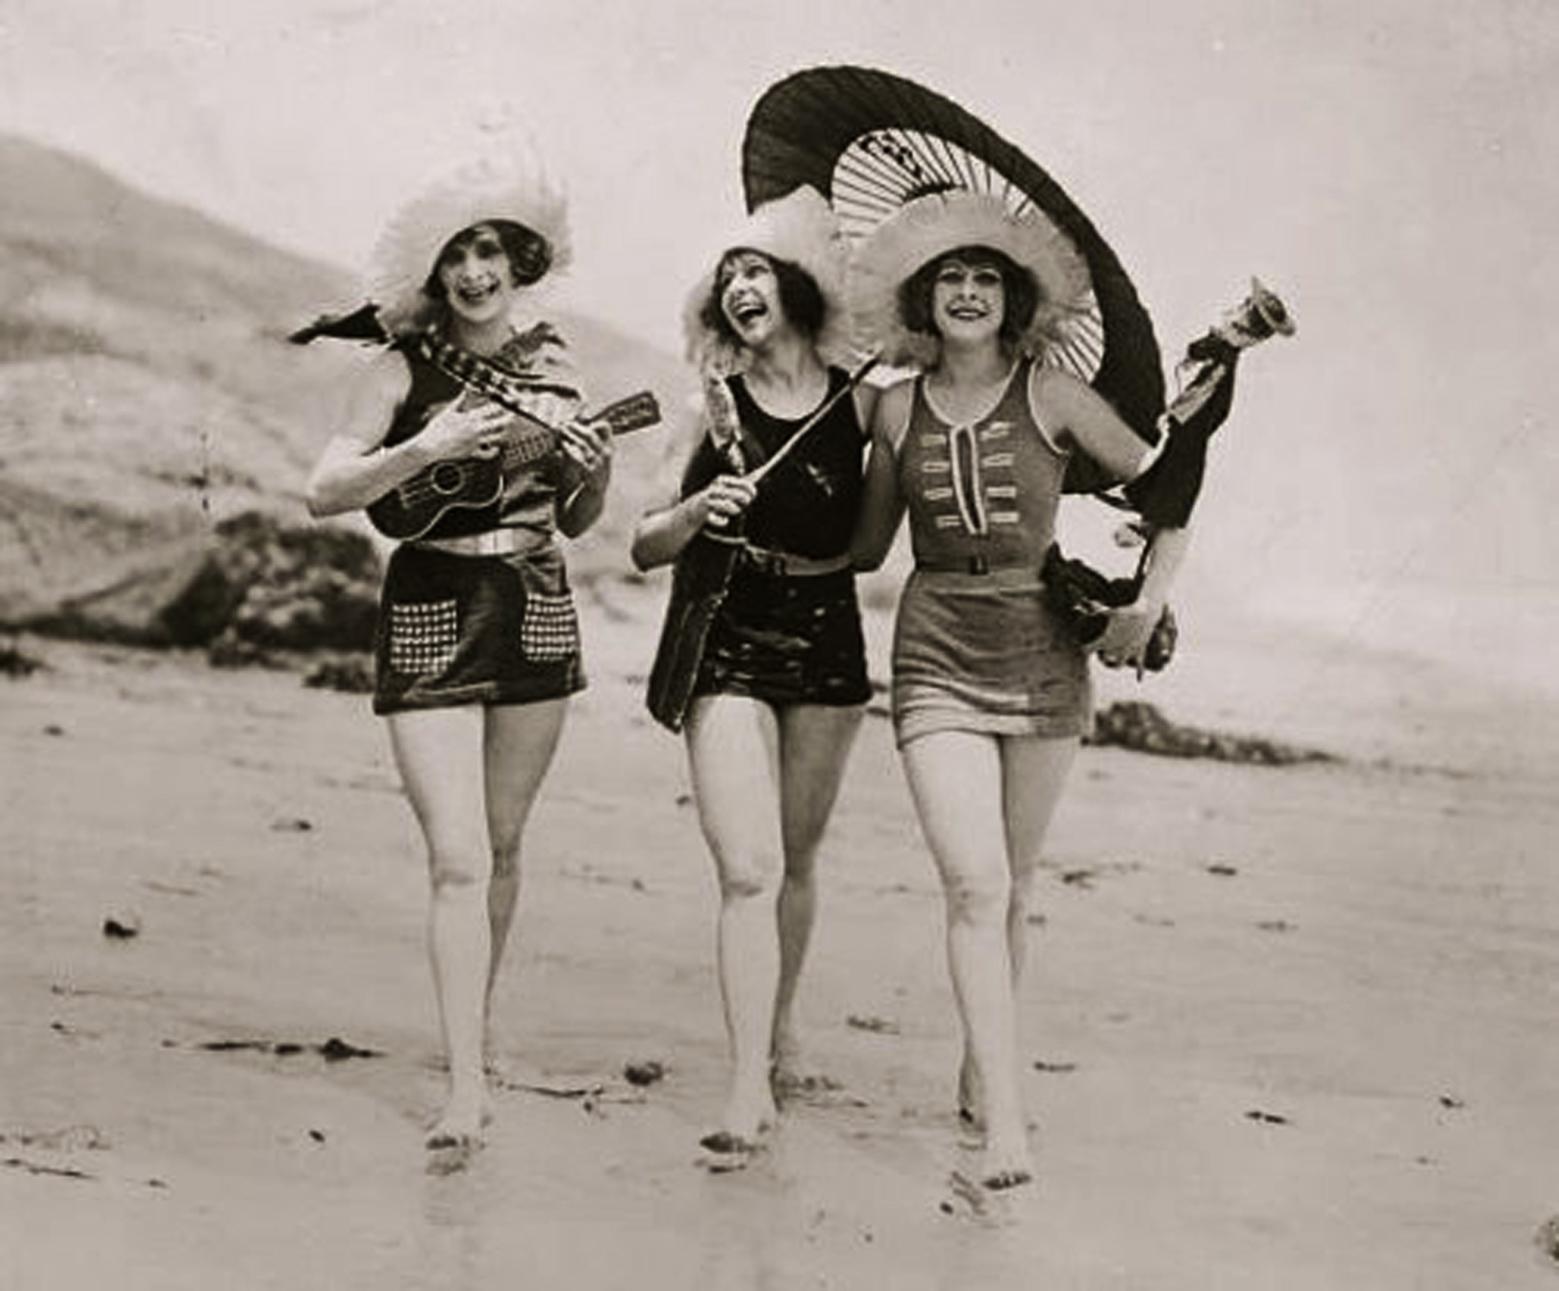 Folli anni venti: fotografie 20s costumi da bagno